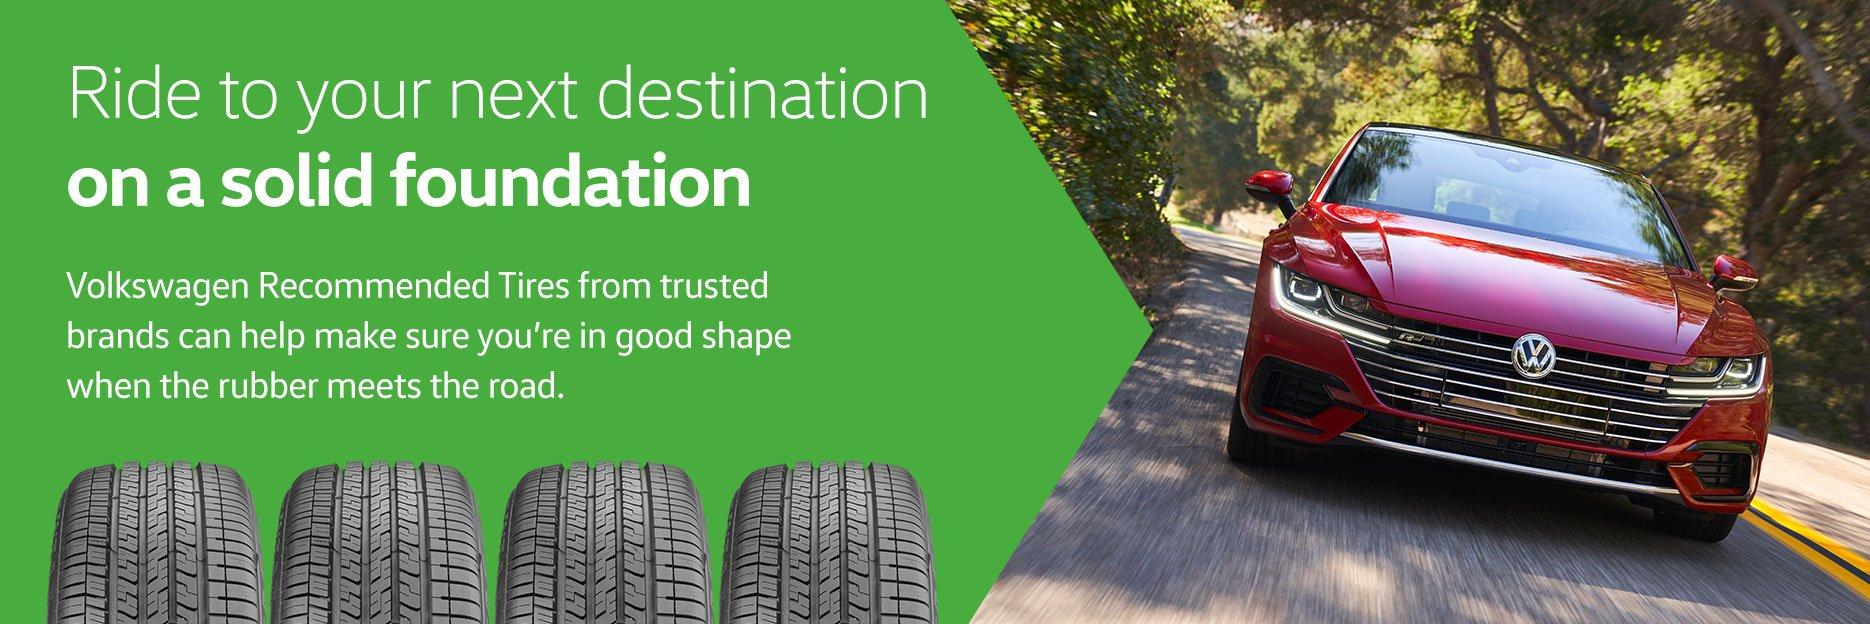 Volkswagen Recommended Tires